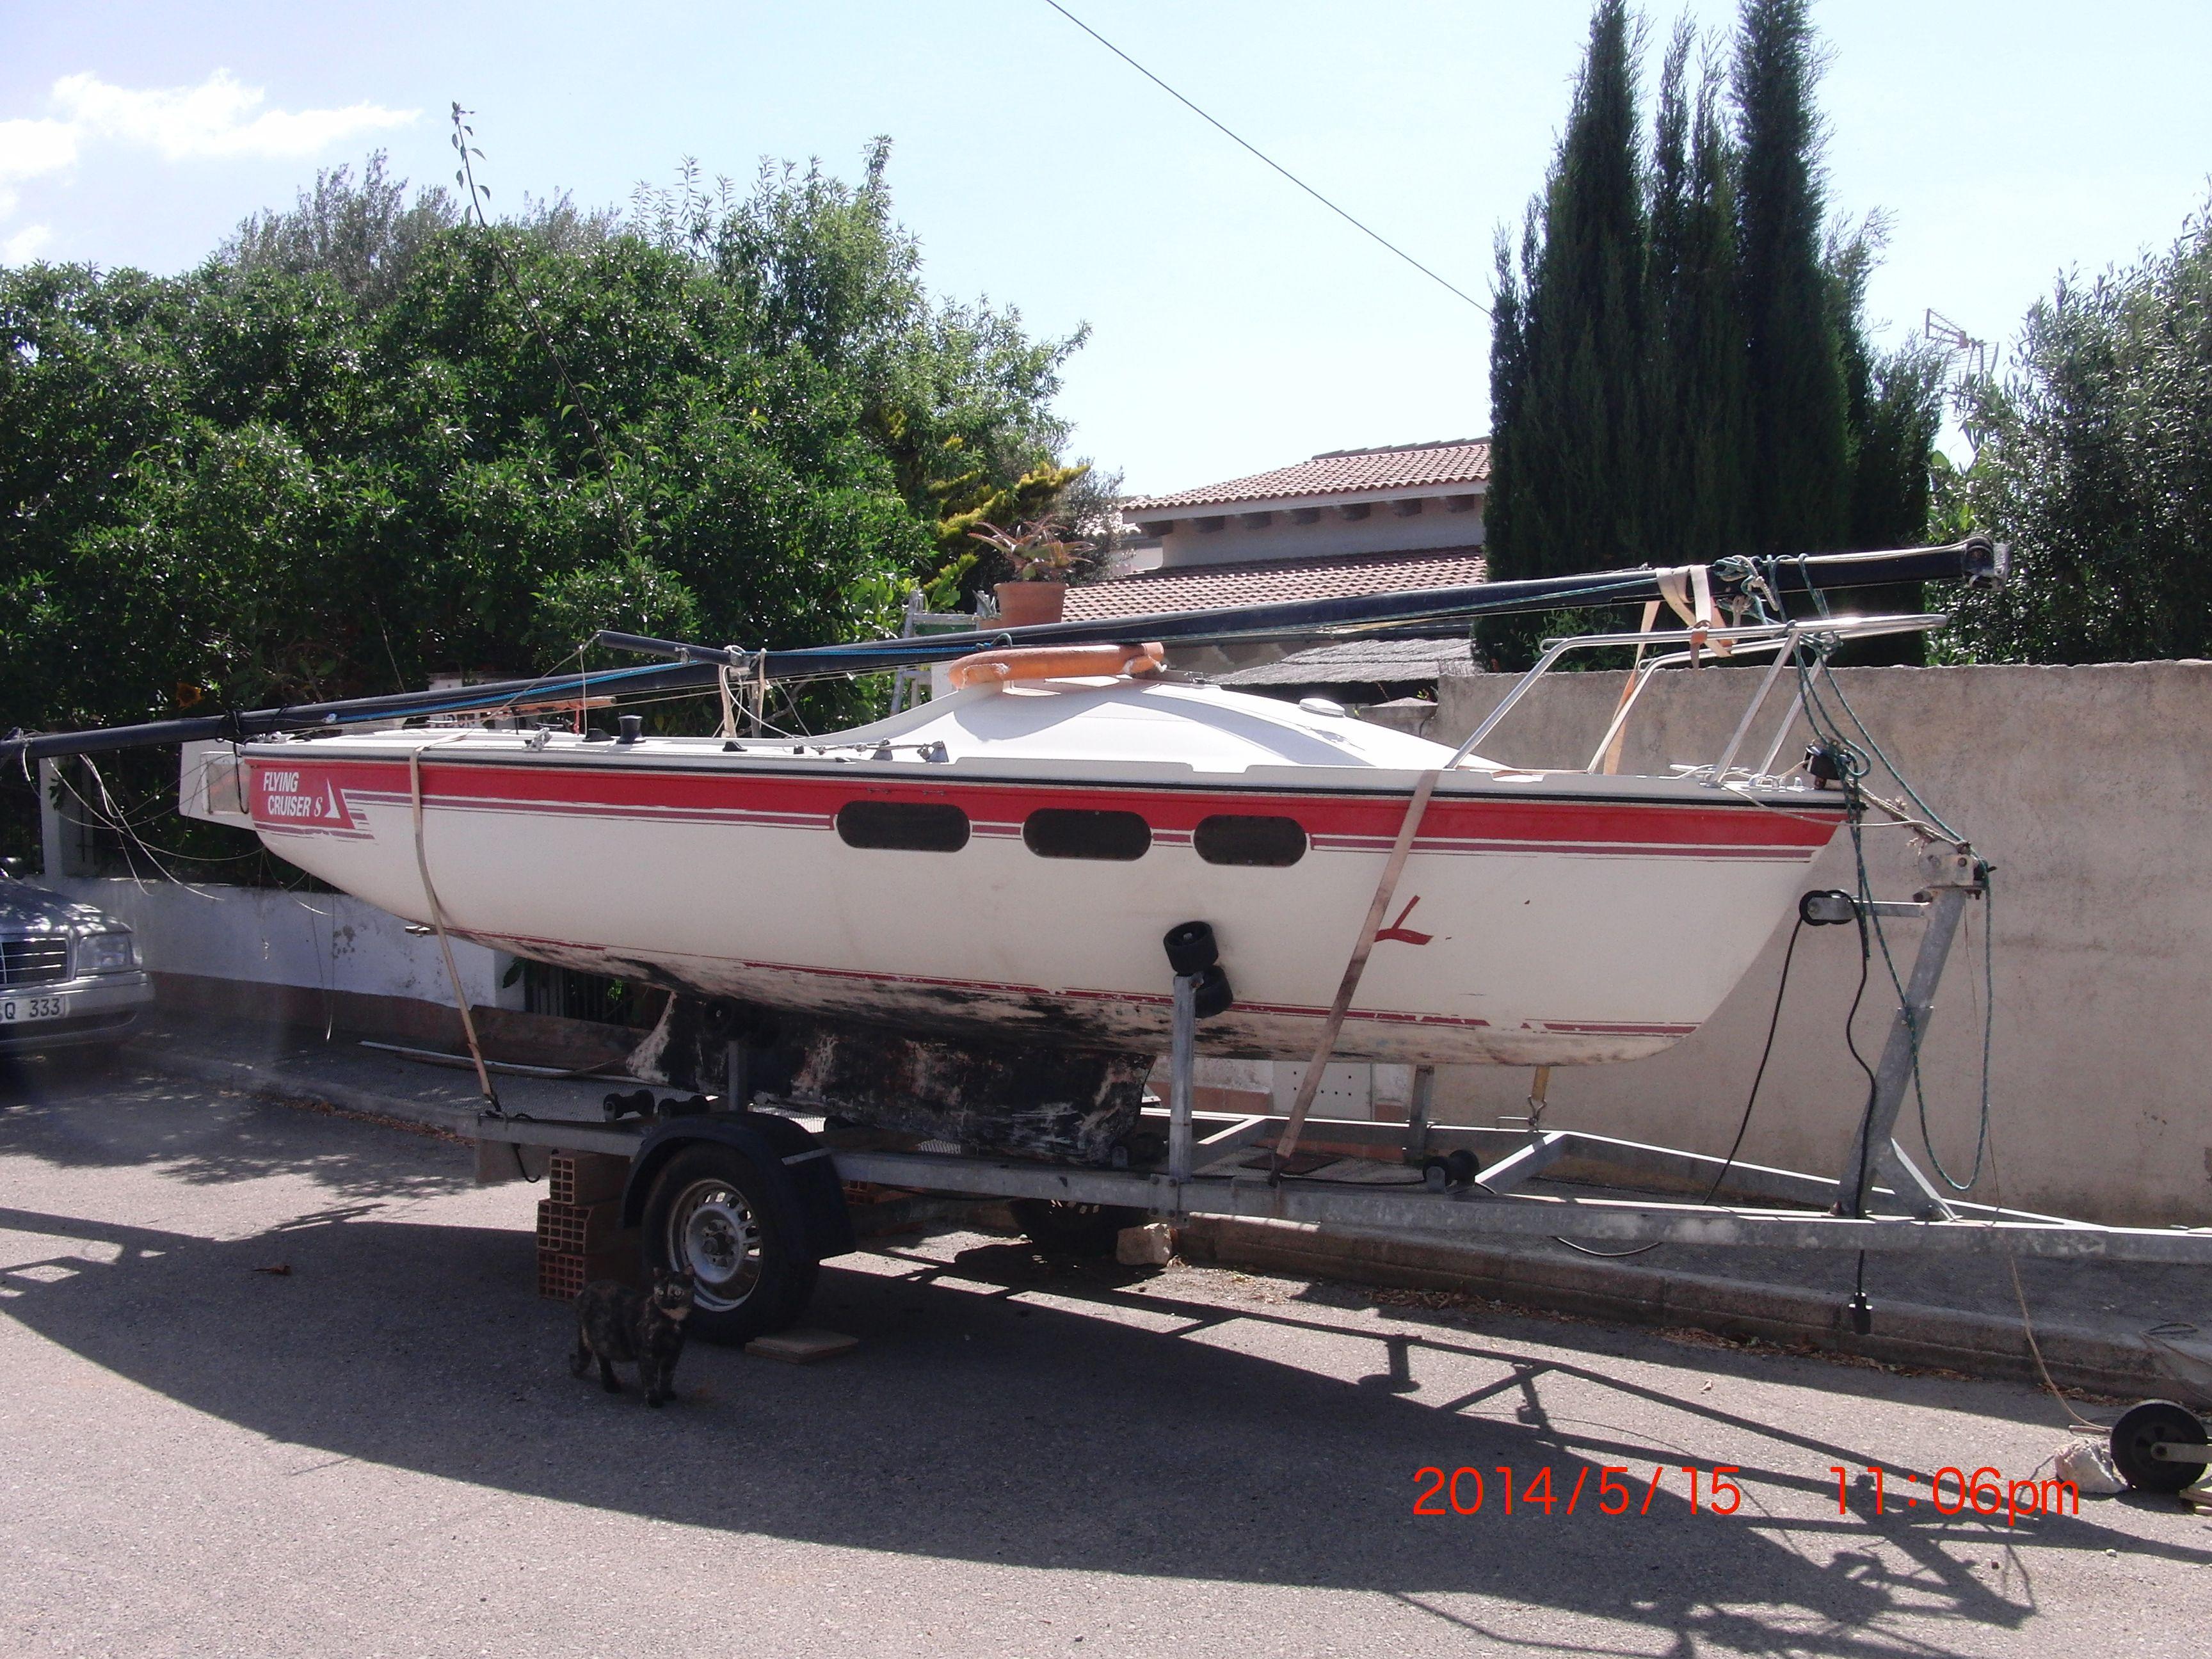 segelboot flying cruiser s bwc mit trailer auf mallorca. Black Bedroom Furniture Sets. Home Design Ideas